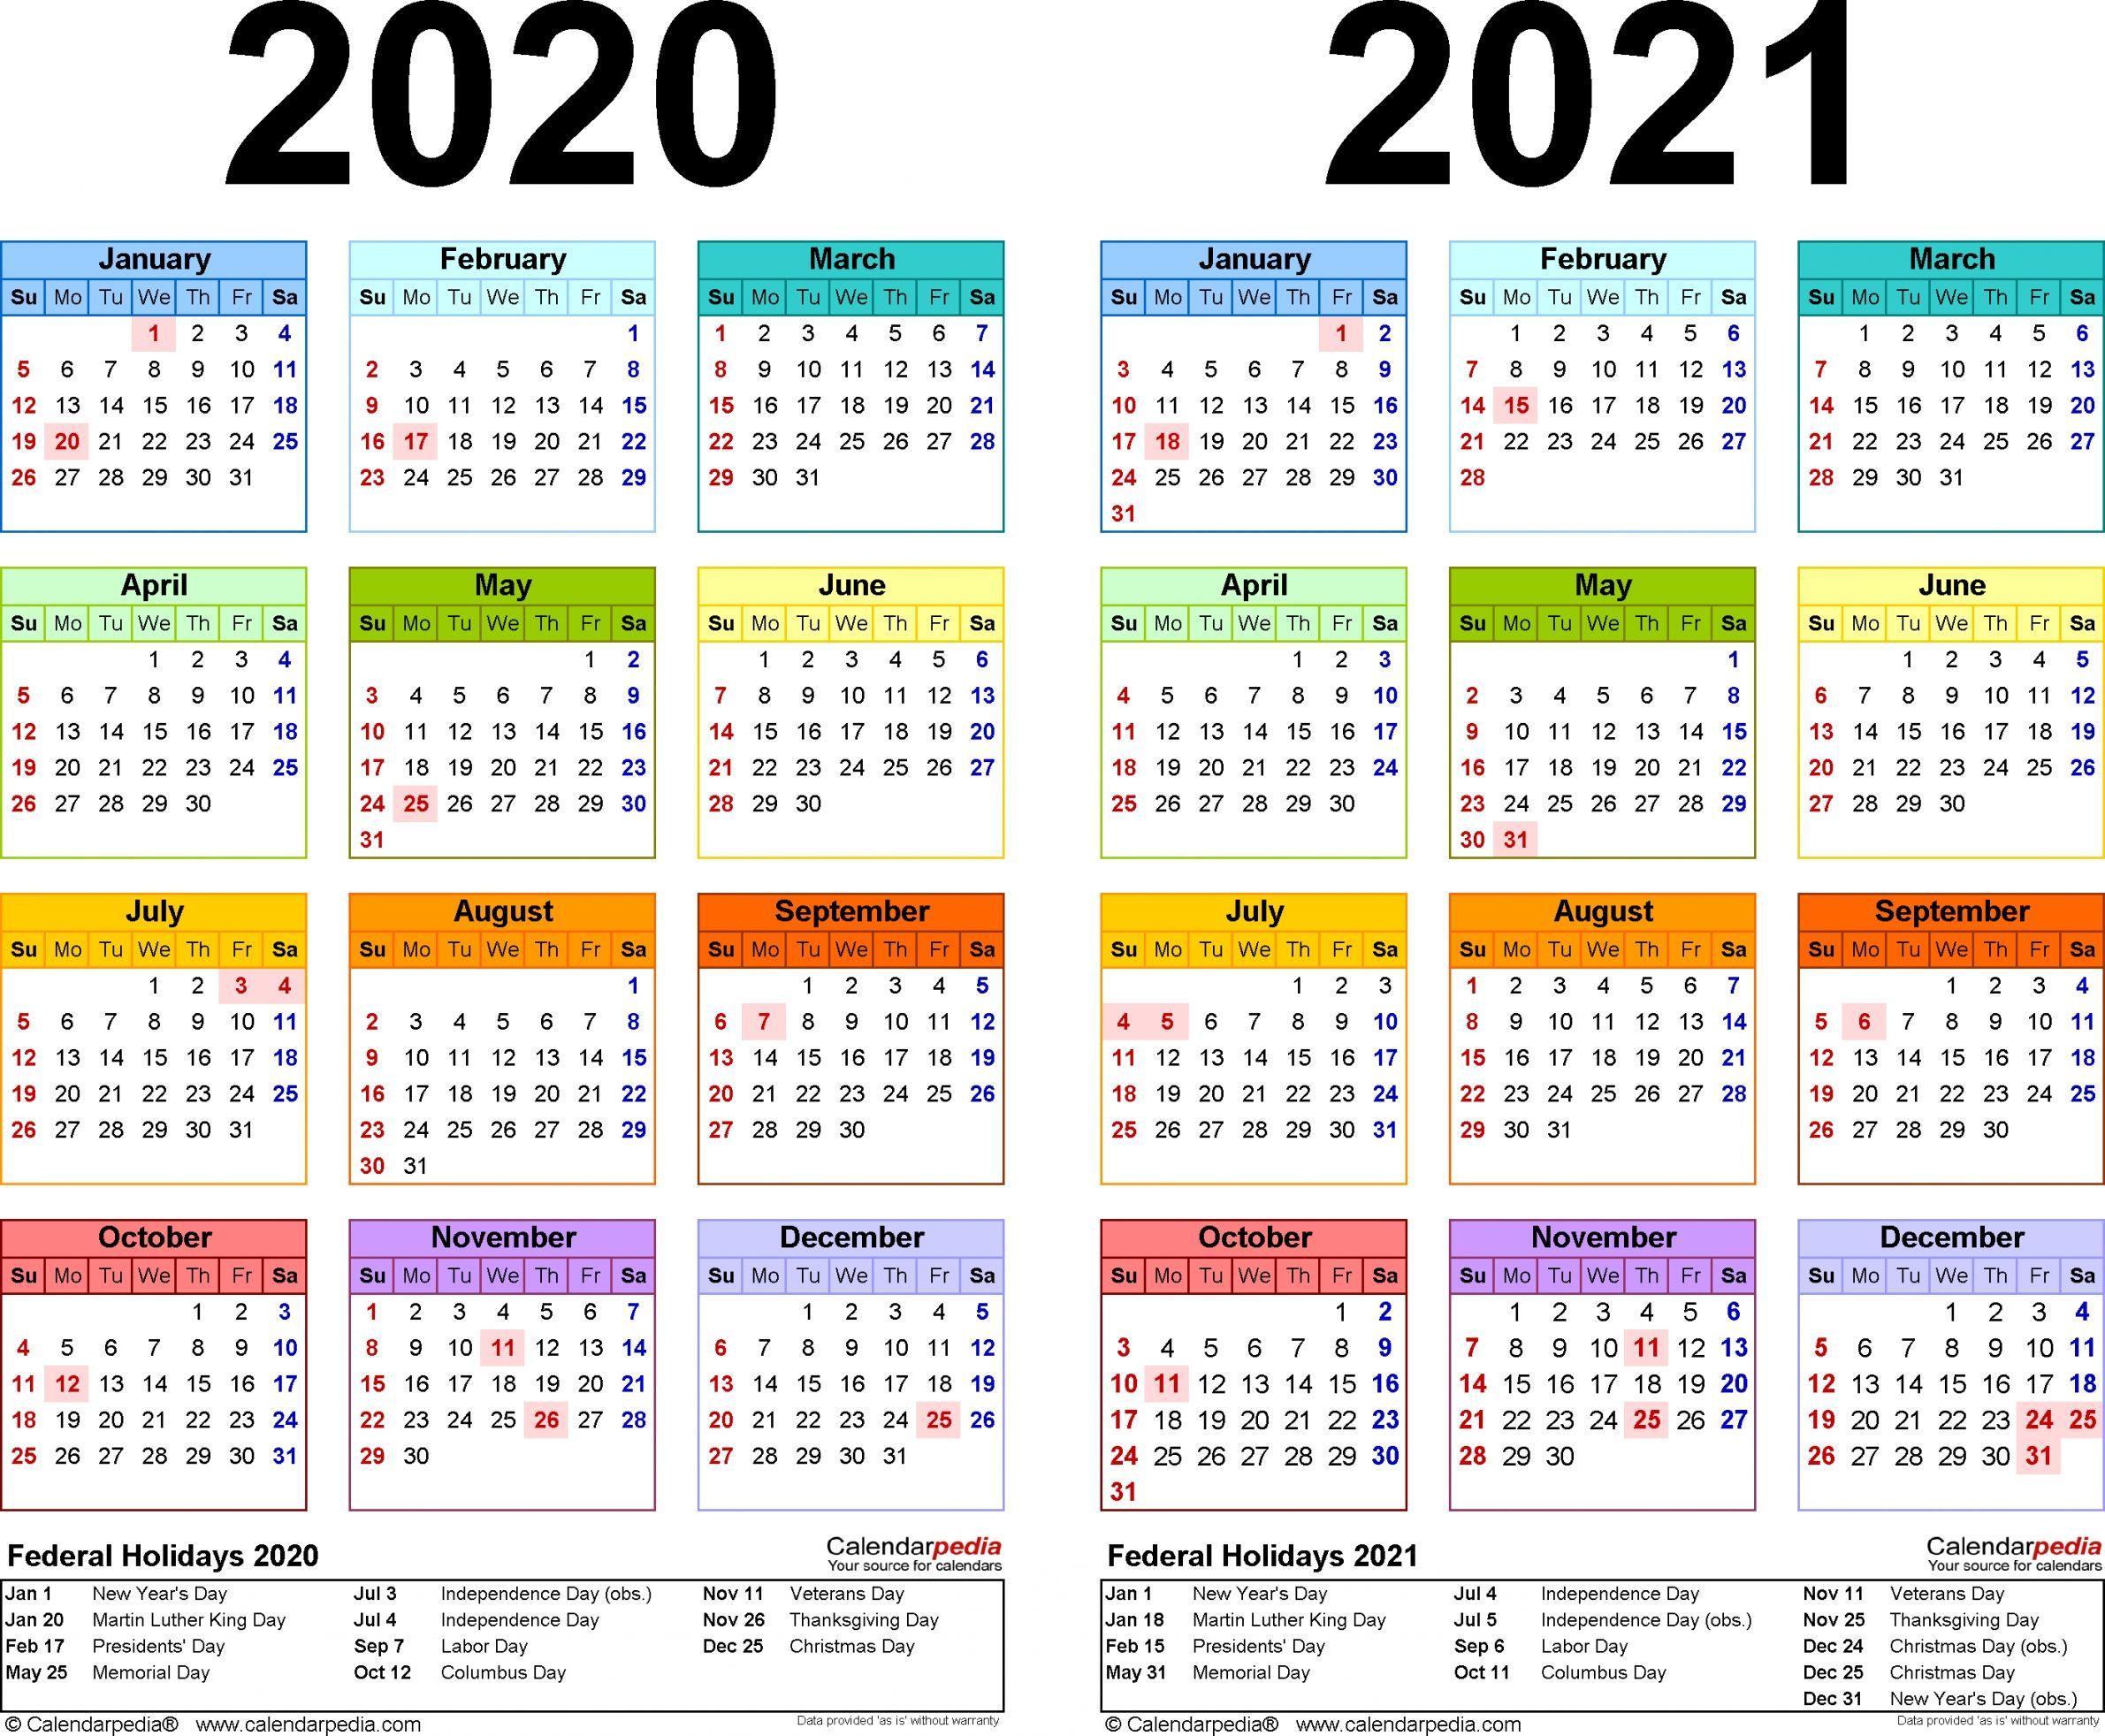 Calendarpedia - Free Download Printable Calendar Templates